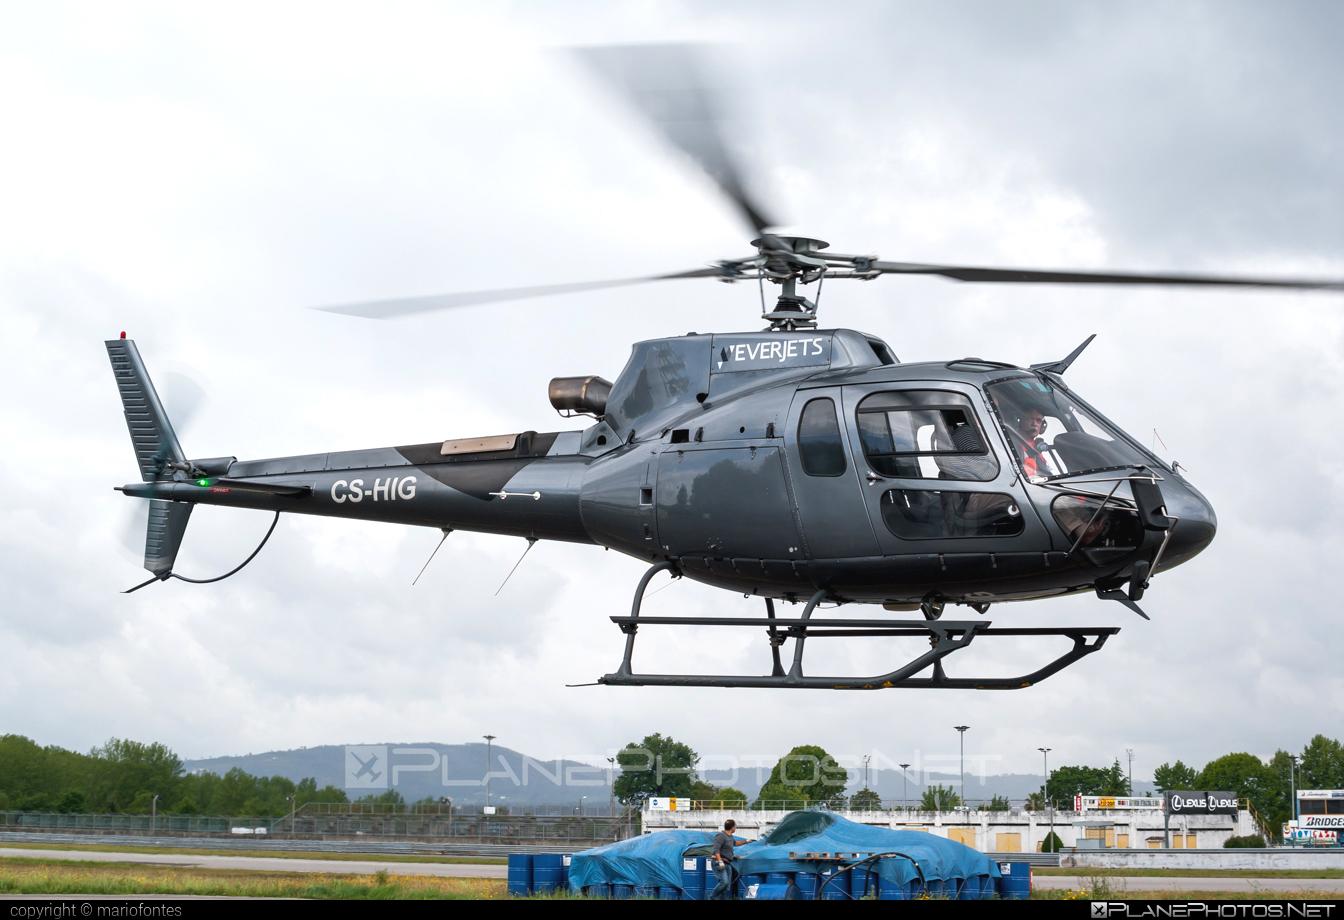 Eurocopter AS350 B3 Ecureuil - CS-HIG operated by Everjets - Aviação Executiva, S.A. #eurocopter #everjets